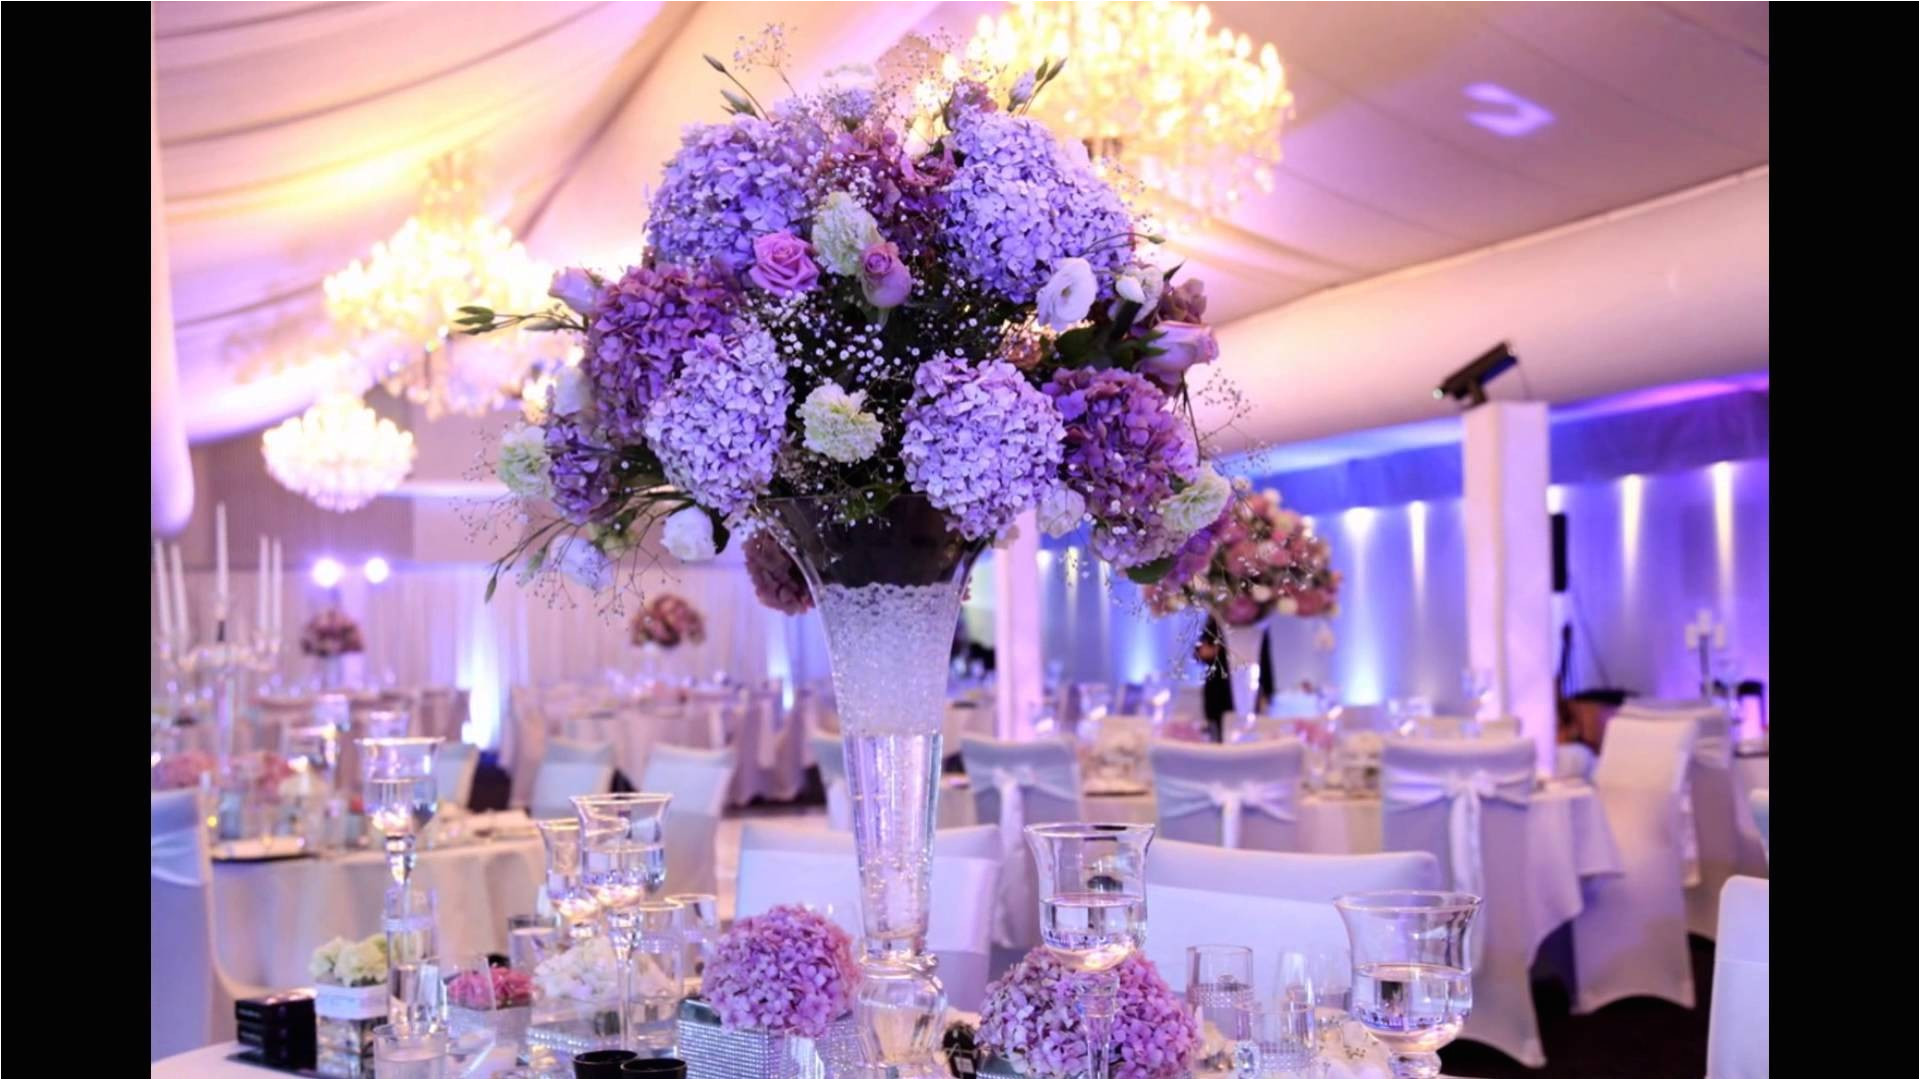 casa de decoracion para bodas bodas sencillas pero bonitas perfect so earthy and pretty with